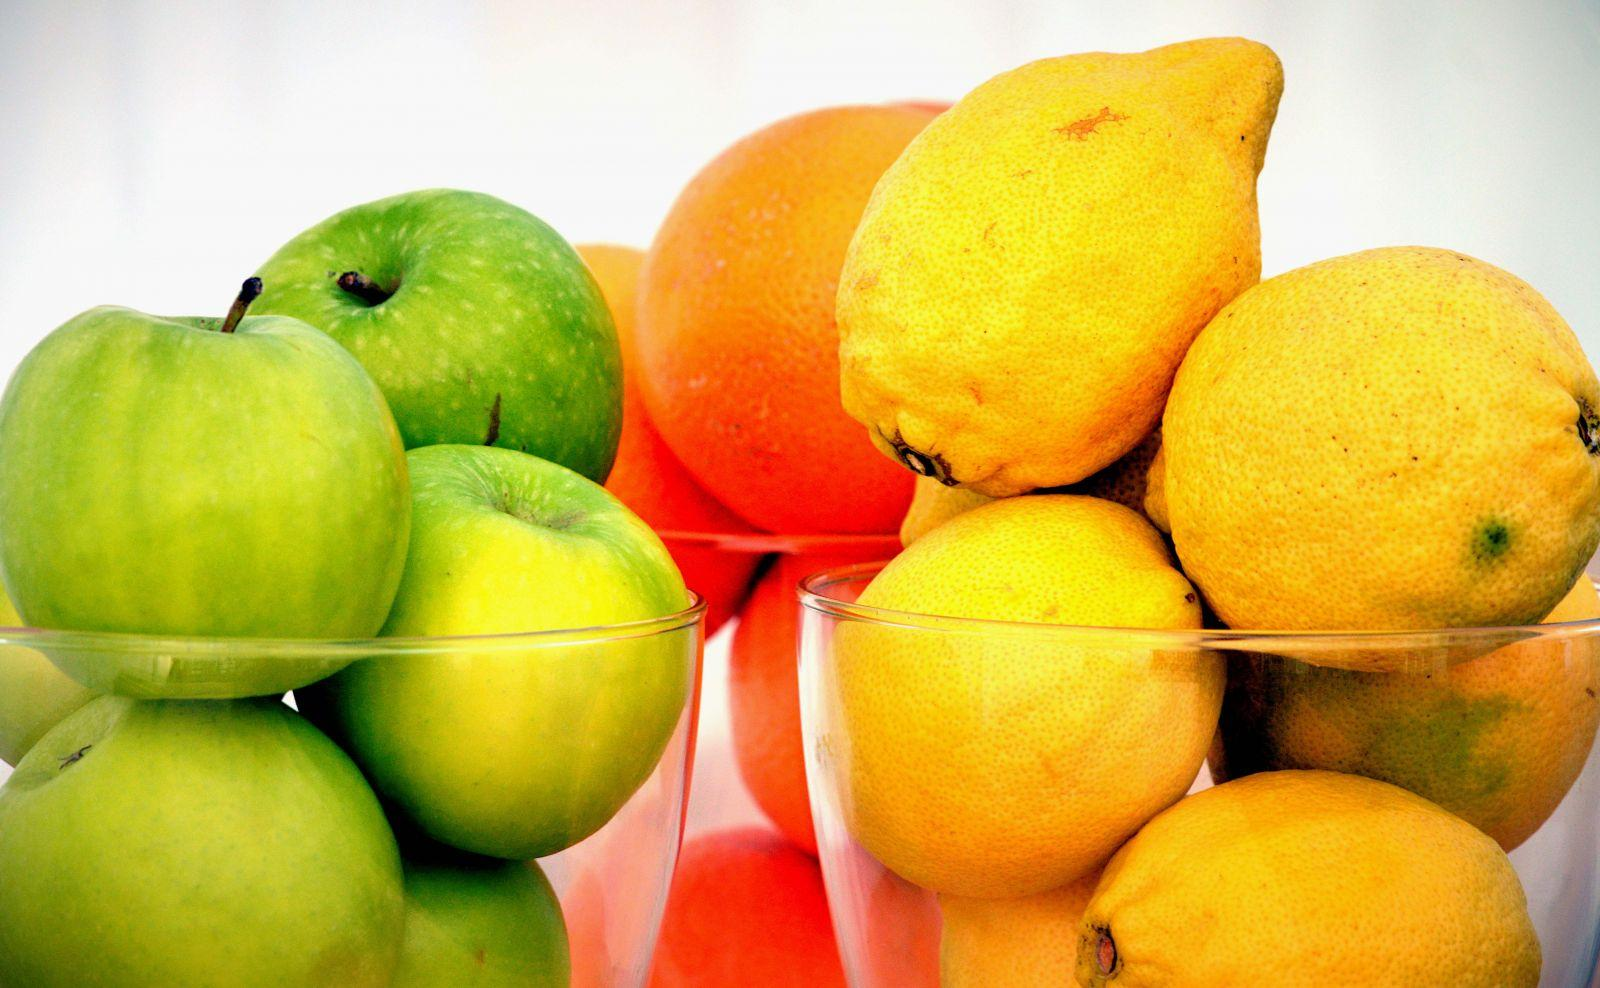 apples, oranges, and lemons